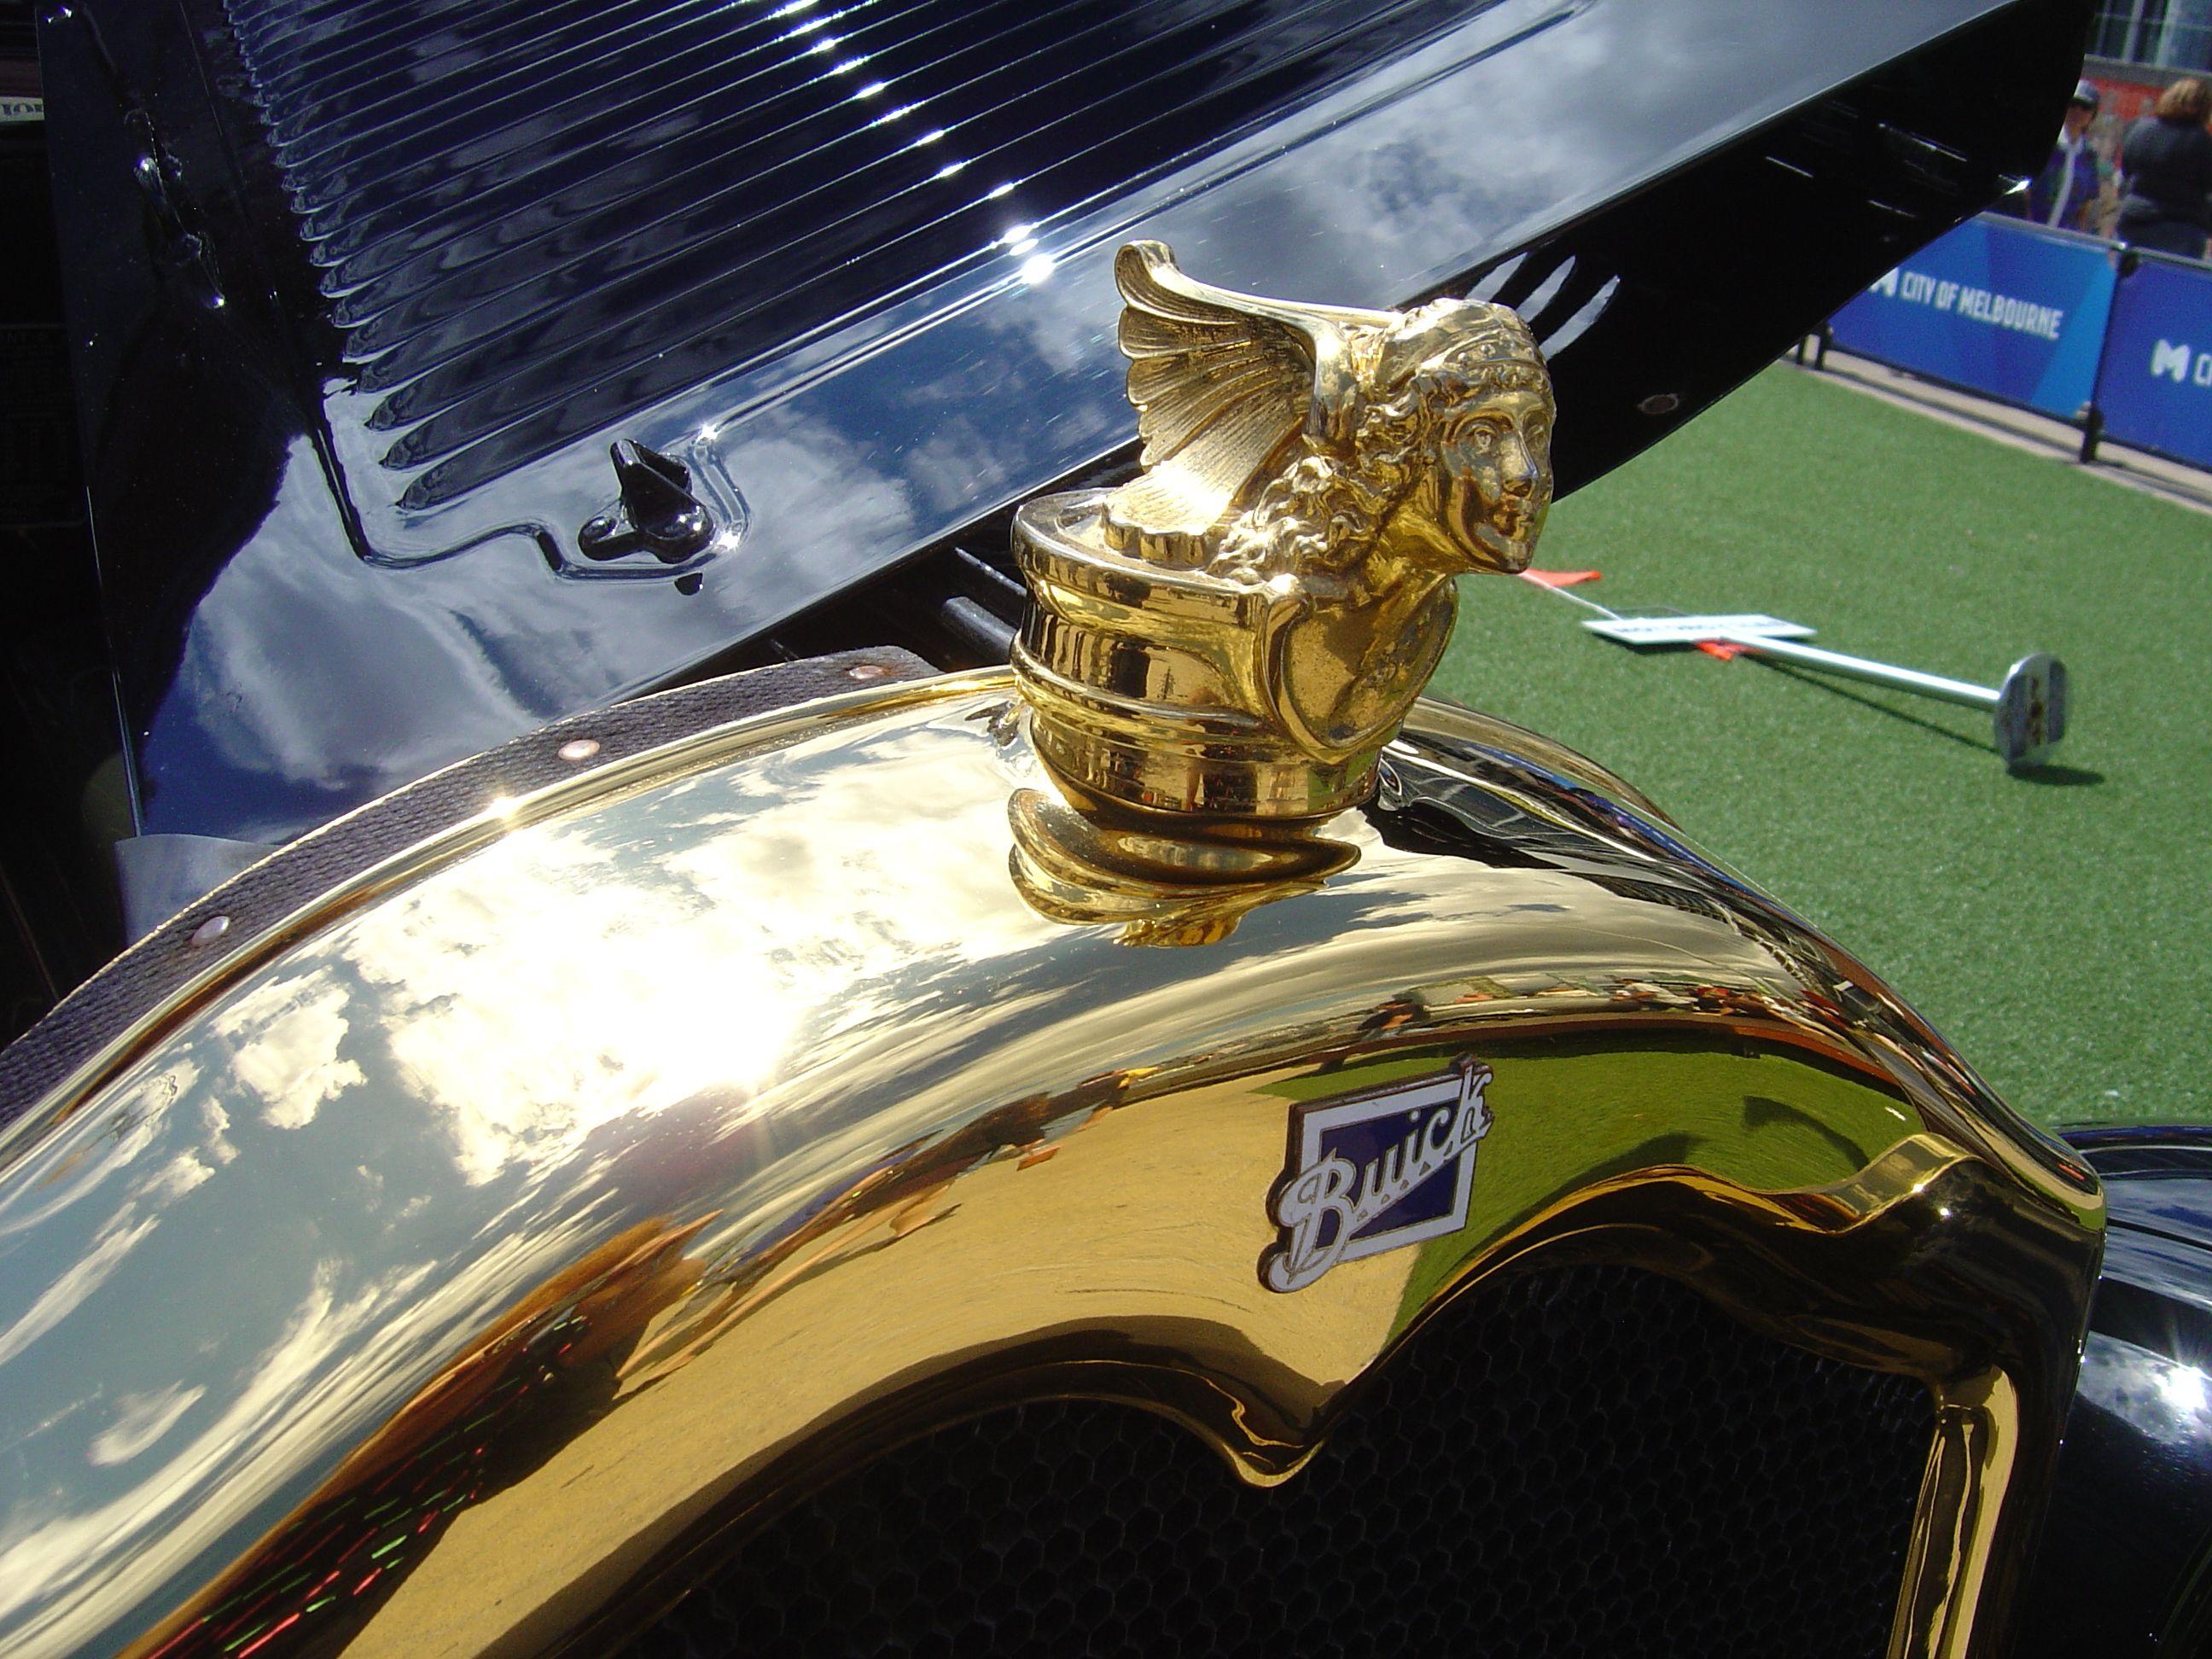 1926 Buick hearse. Radiator ornament. Hood ornaments